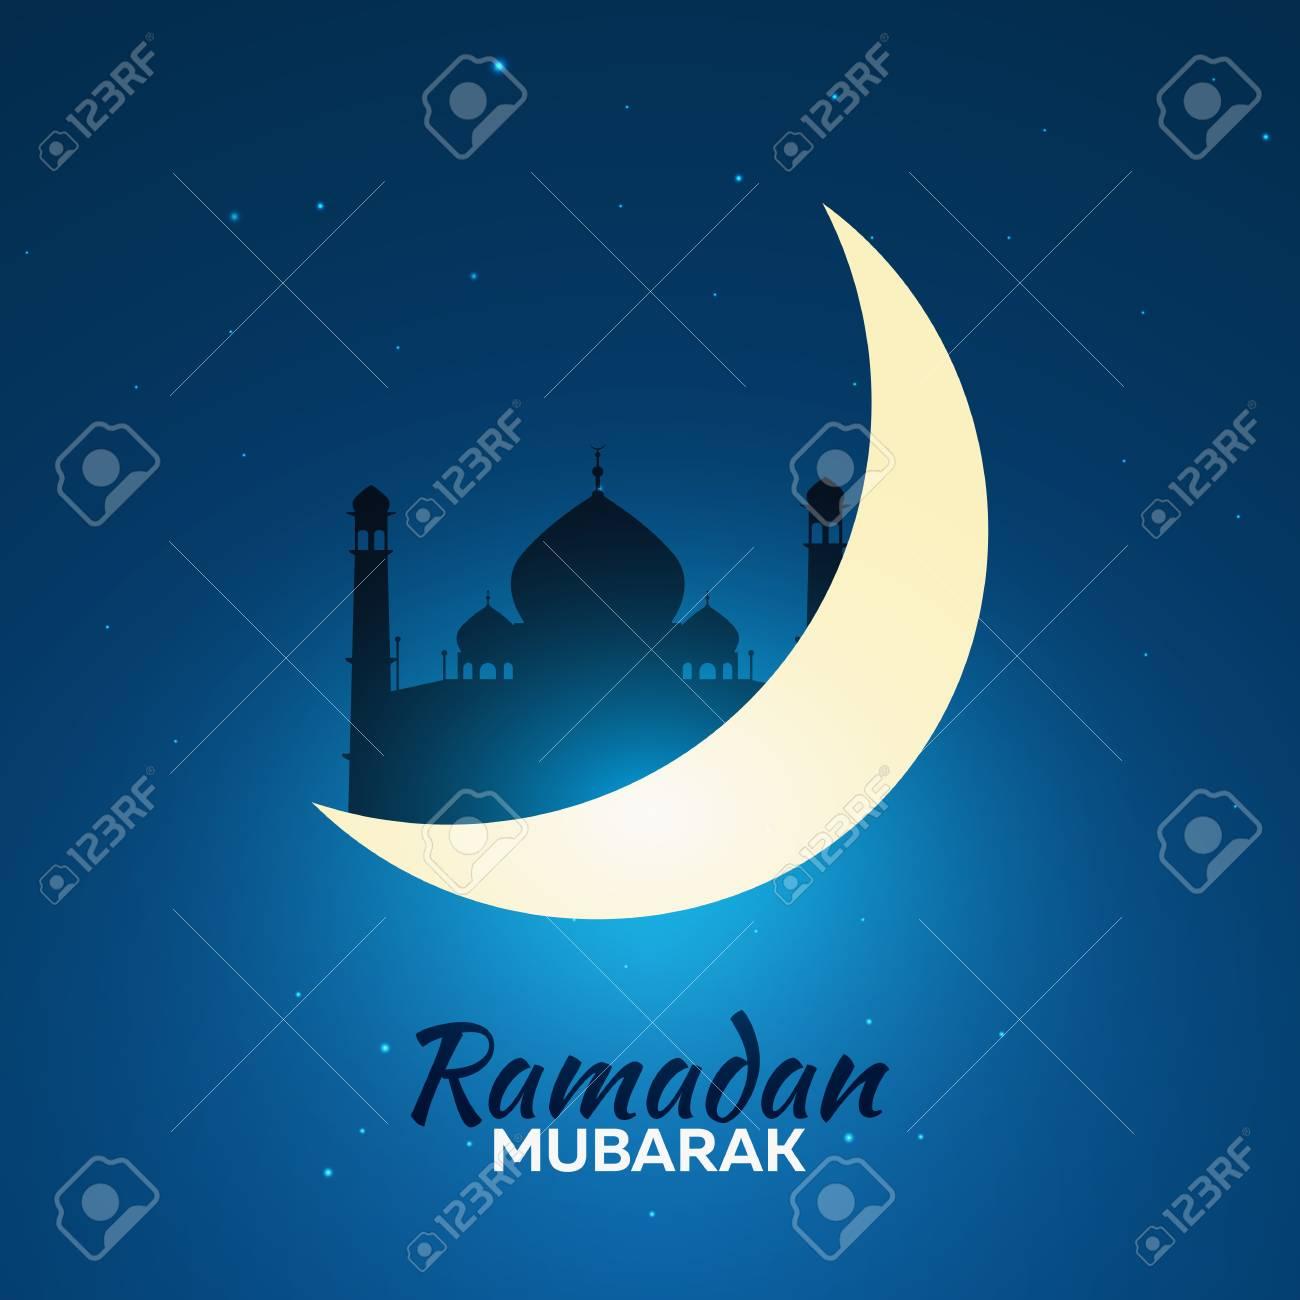 Ramadan kareem ramadan mubarak greeting card arabian night ramadan kareem ramadan mubarak greeting card arabian night with crescent moon stock vector m4hsunfo Choice Image